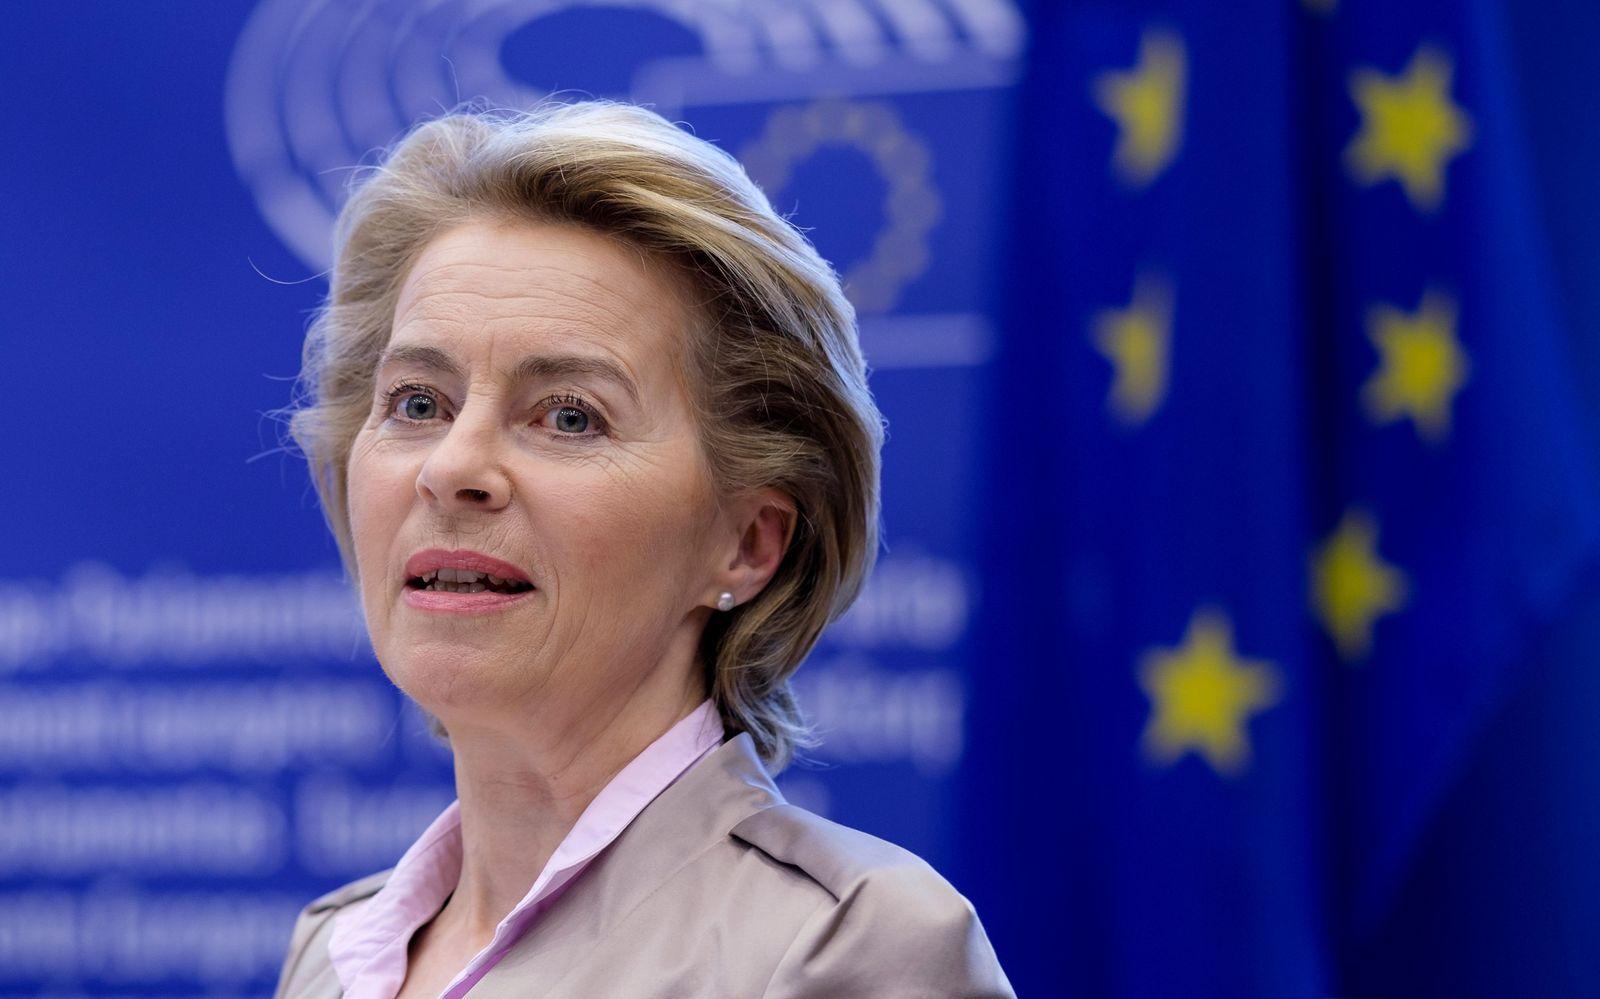 EU parliament conference of President, Brussels, Belgium - 23 Jun 2020